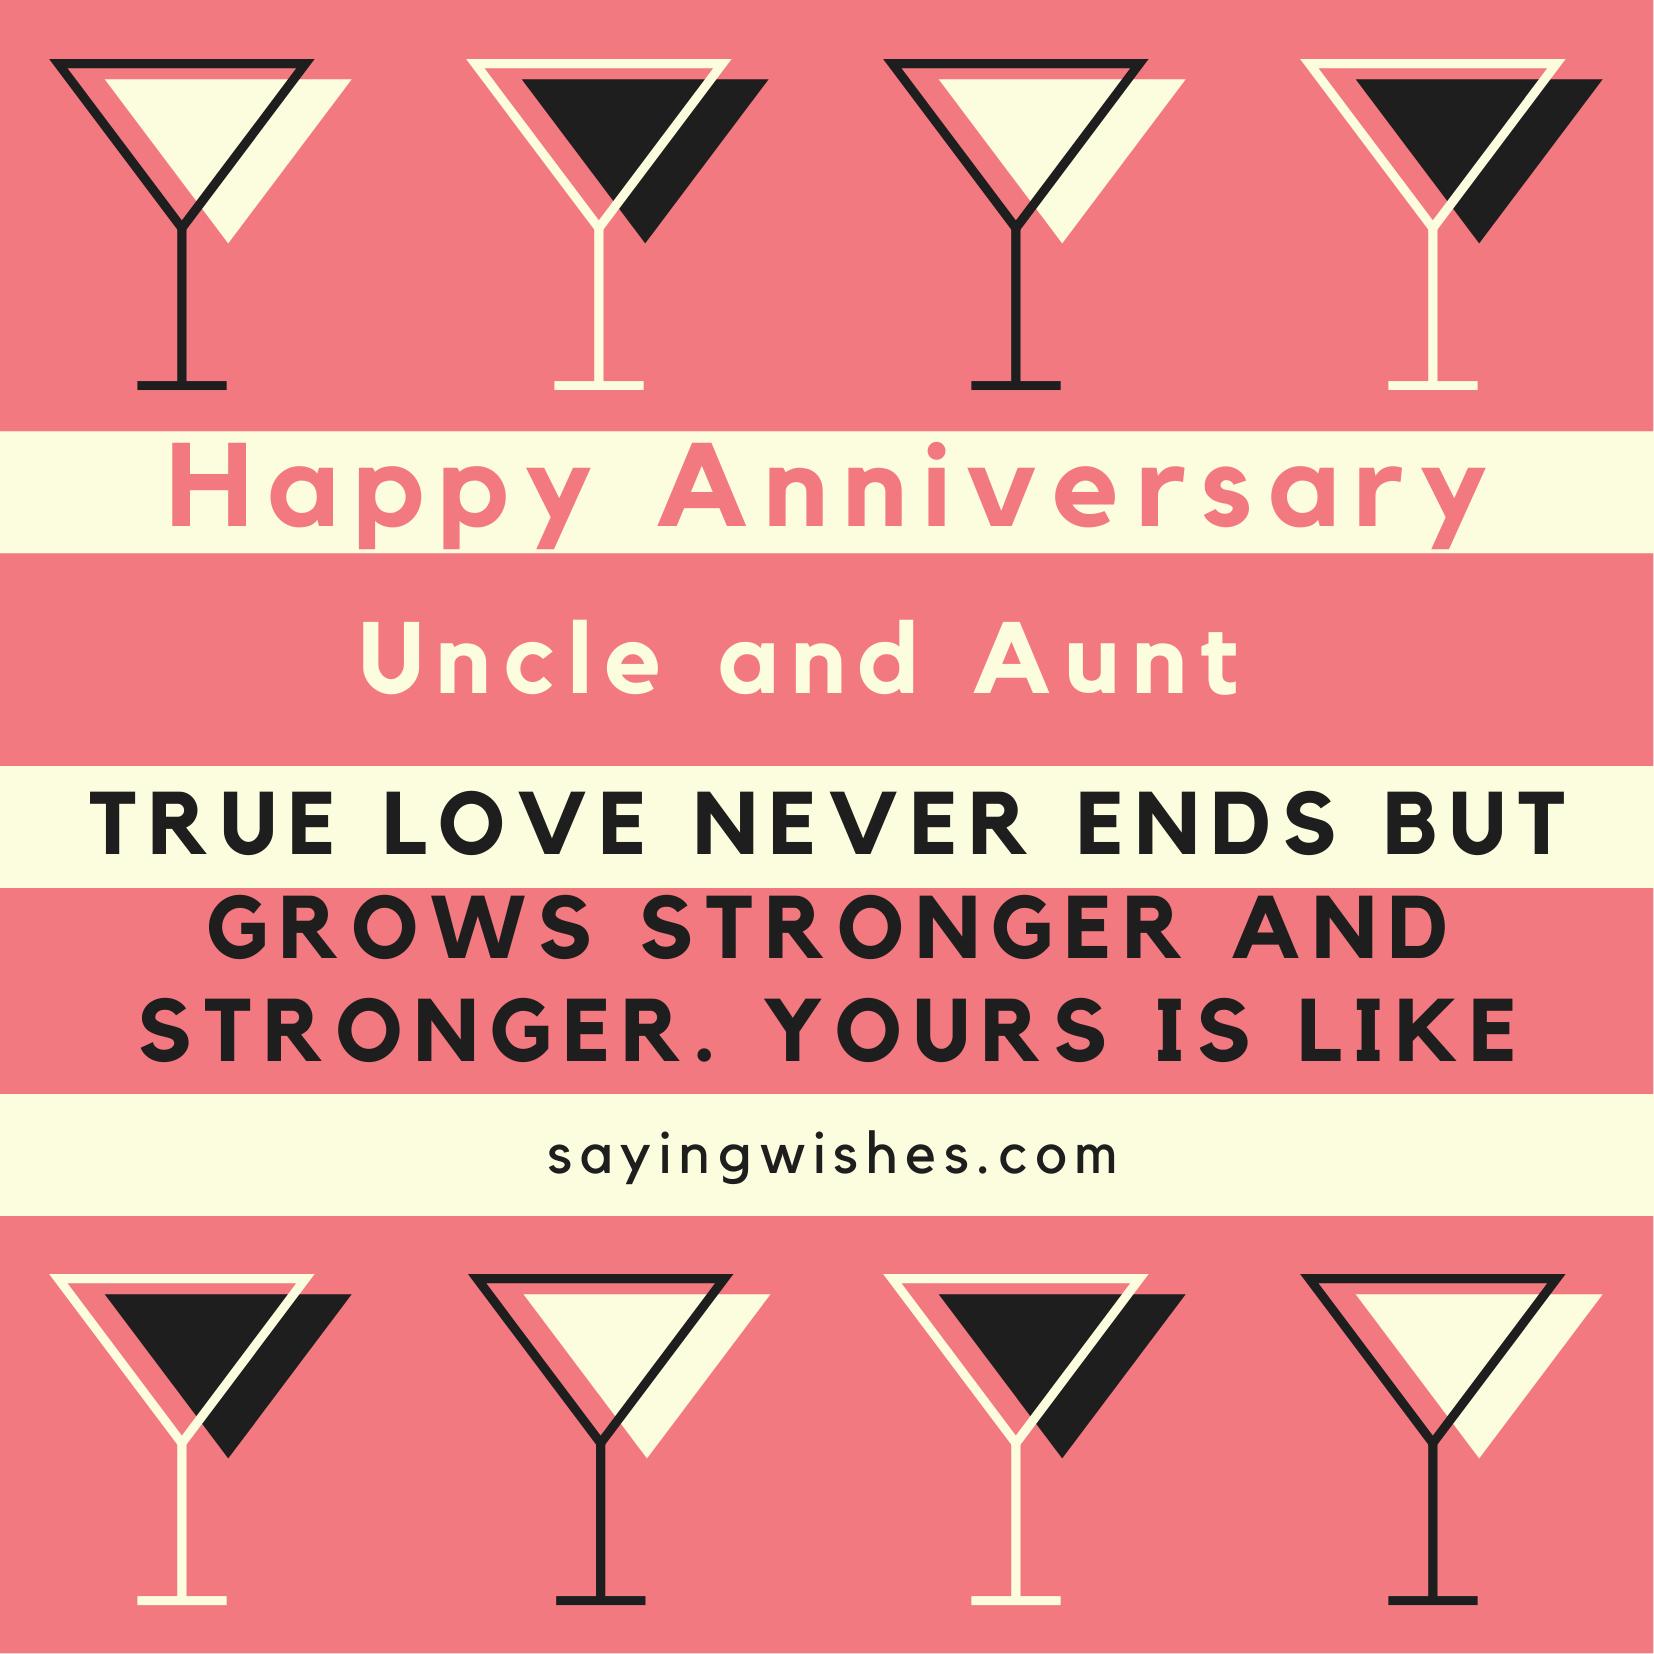 sweet anniversary wishes for uncle ji and aunty ji